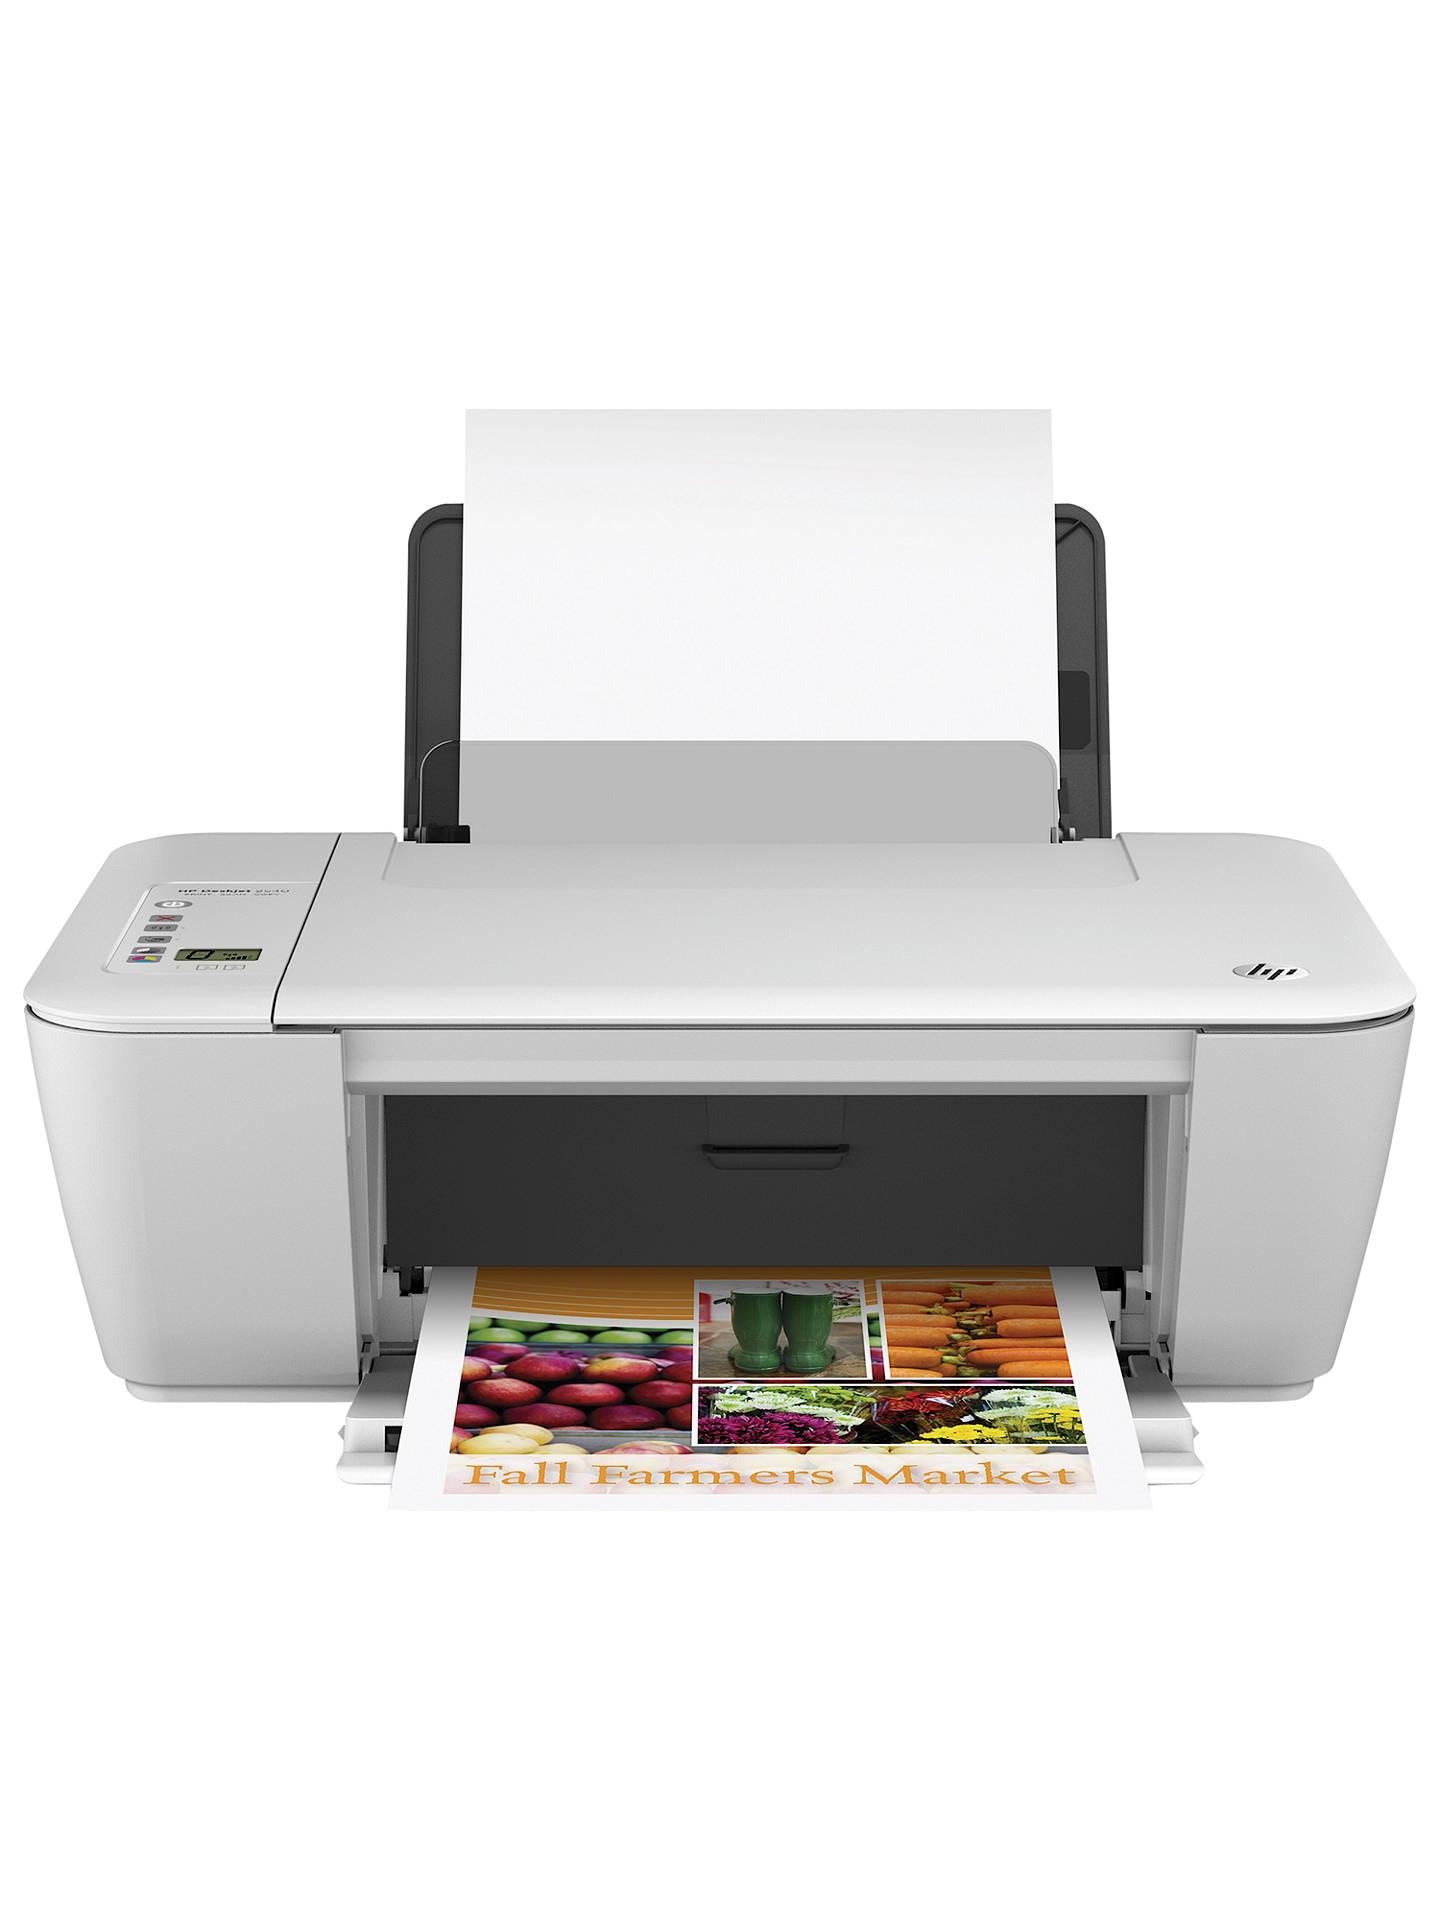 Hp Deskjet 2540 All In One Printer At John Lewis Amp Partners